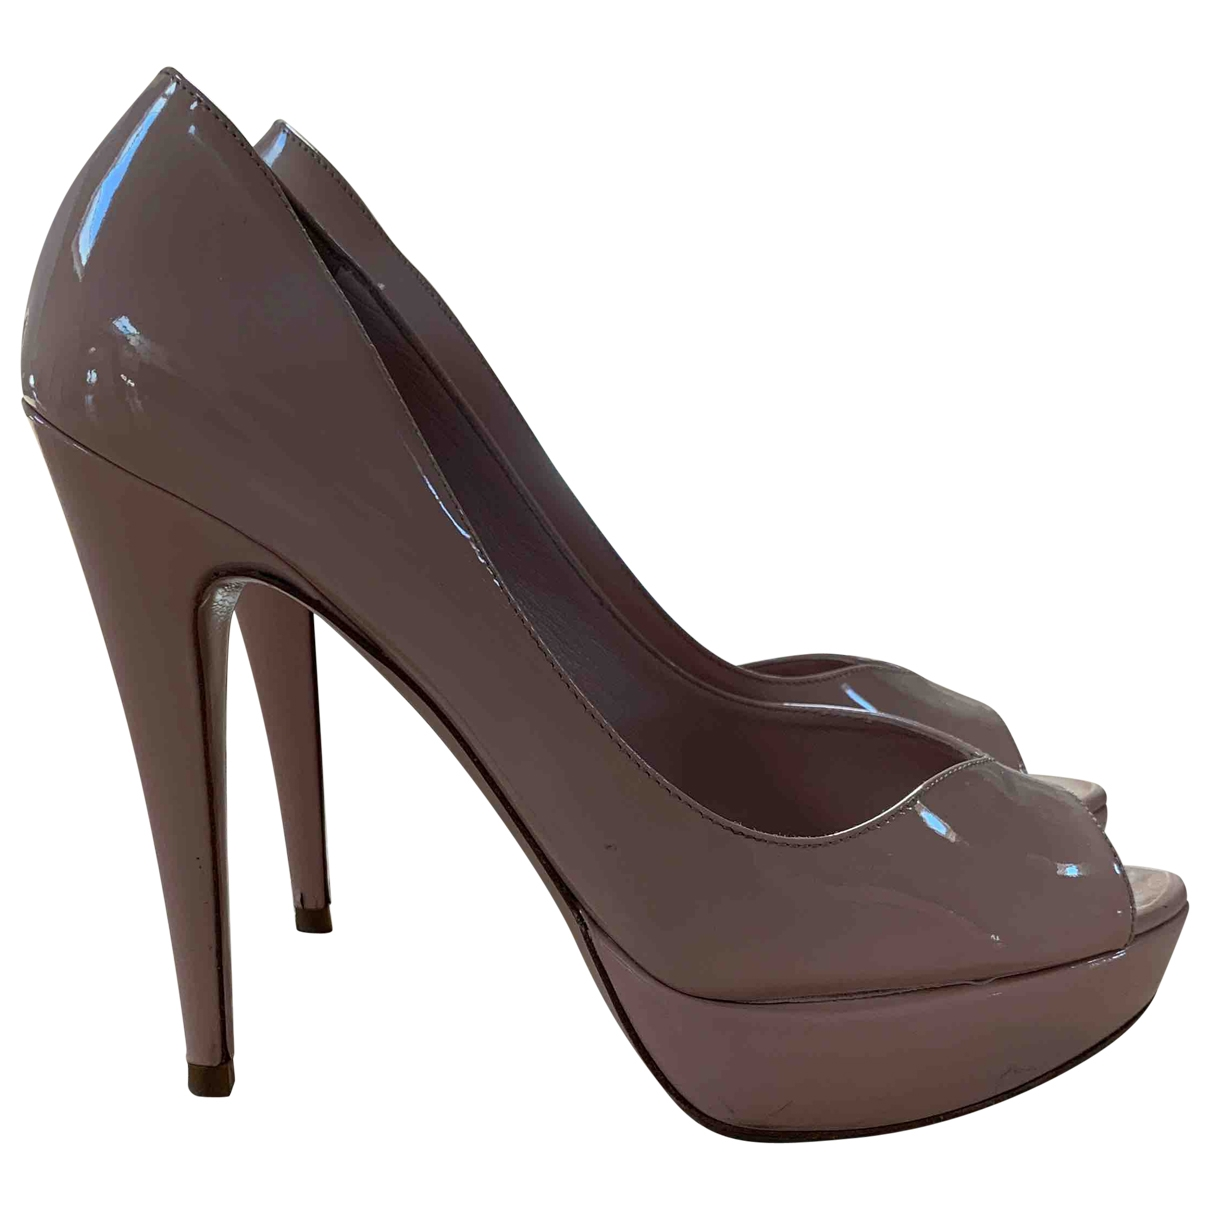 Miu Miu \N Pink Patent leather Heels for Women 39 IT